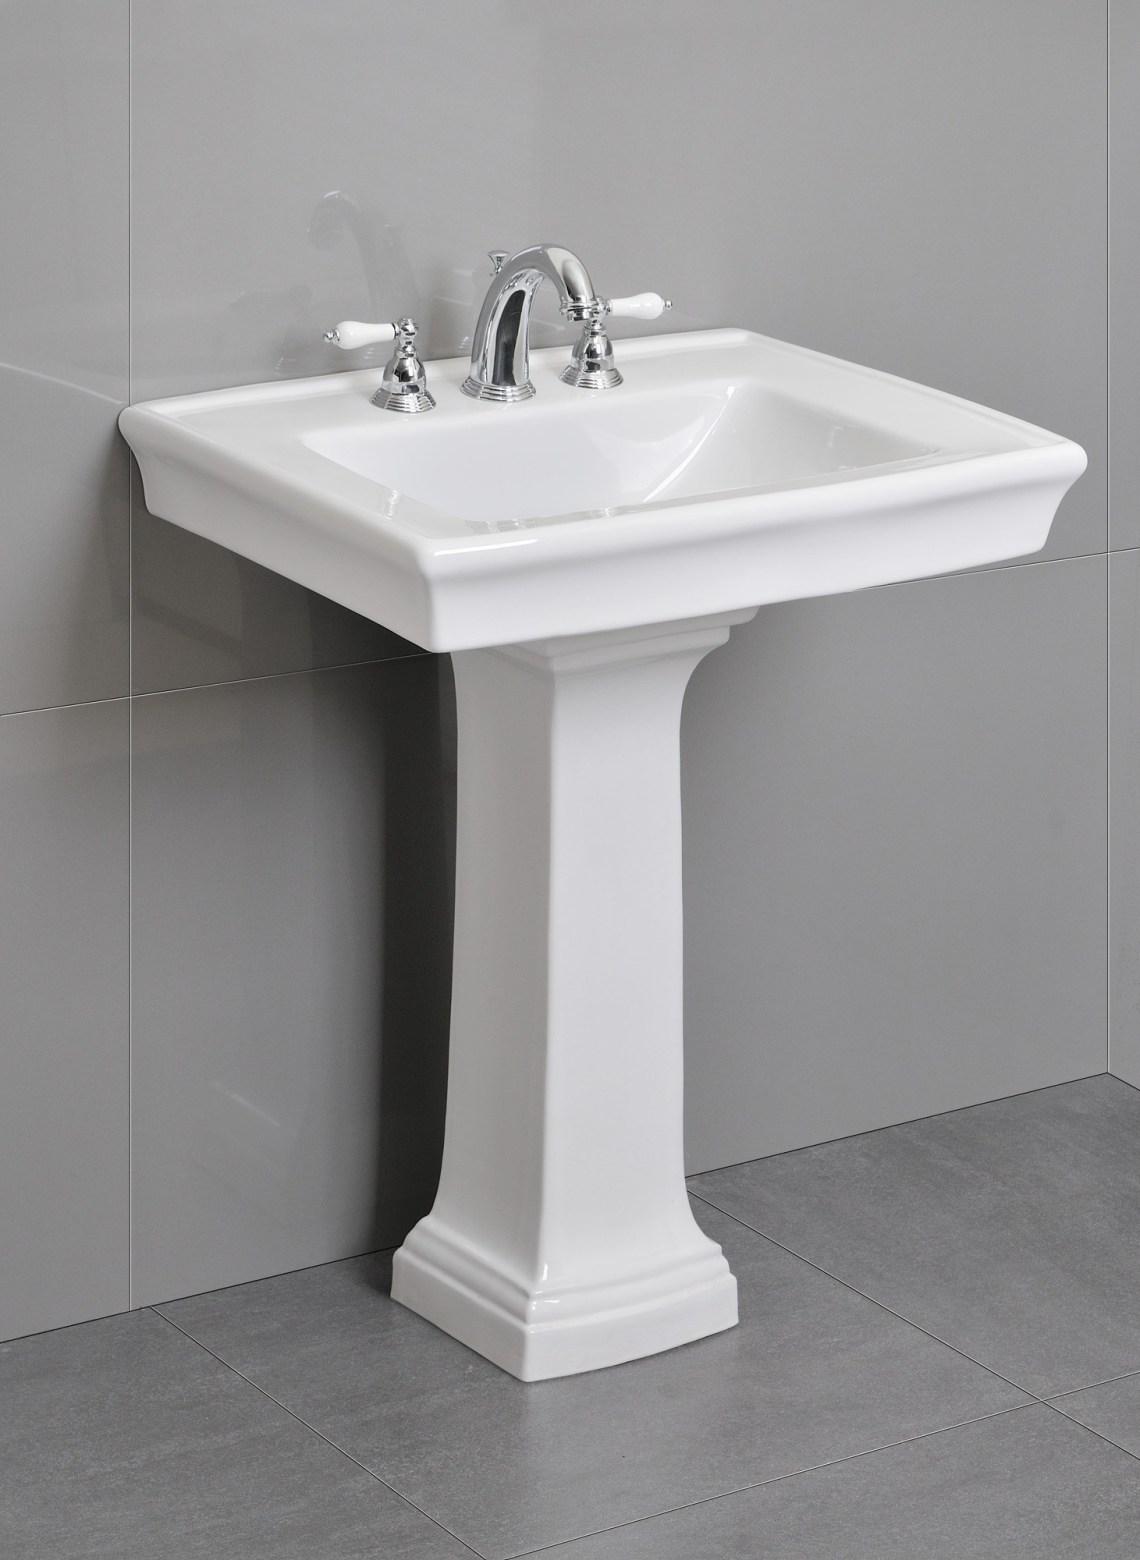 Various Models of Bathroom Sink - InspirationSeek.com